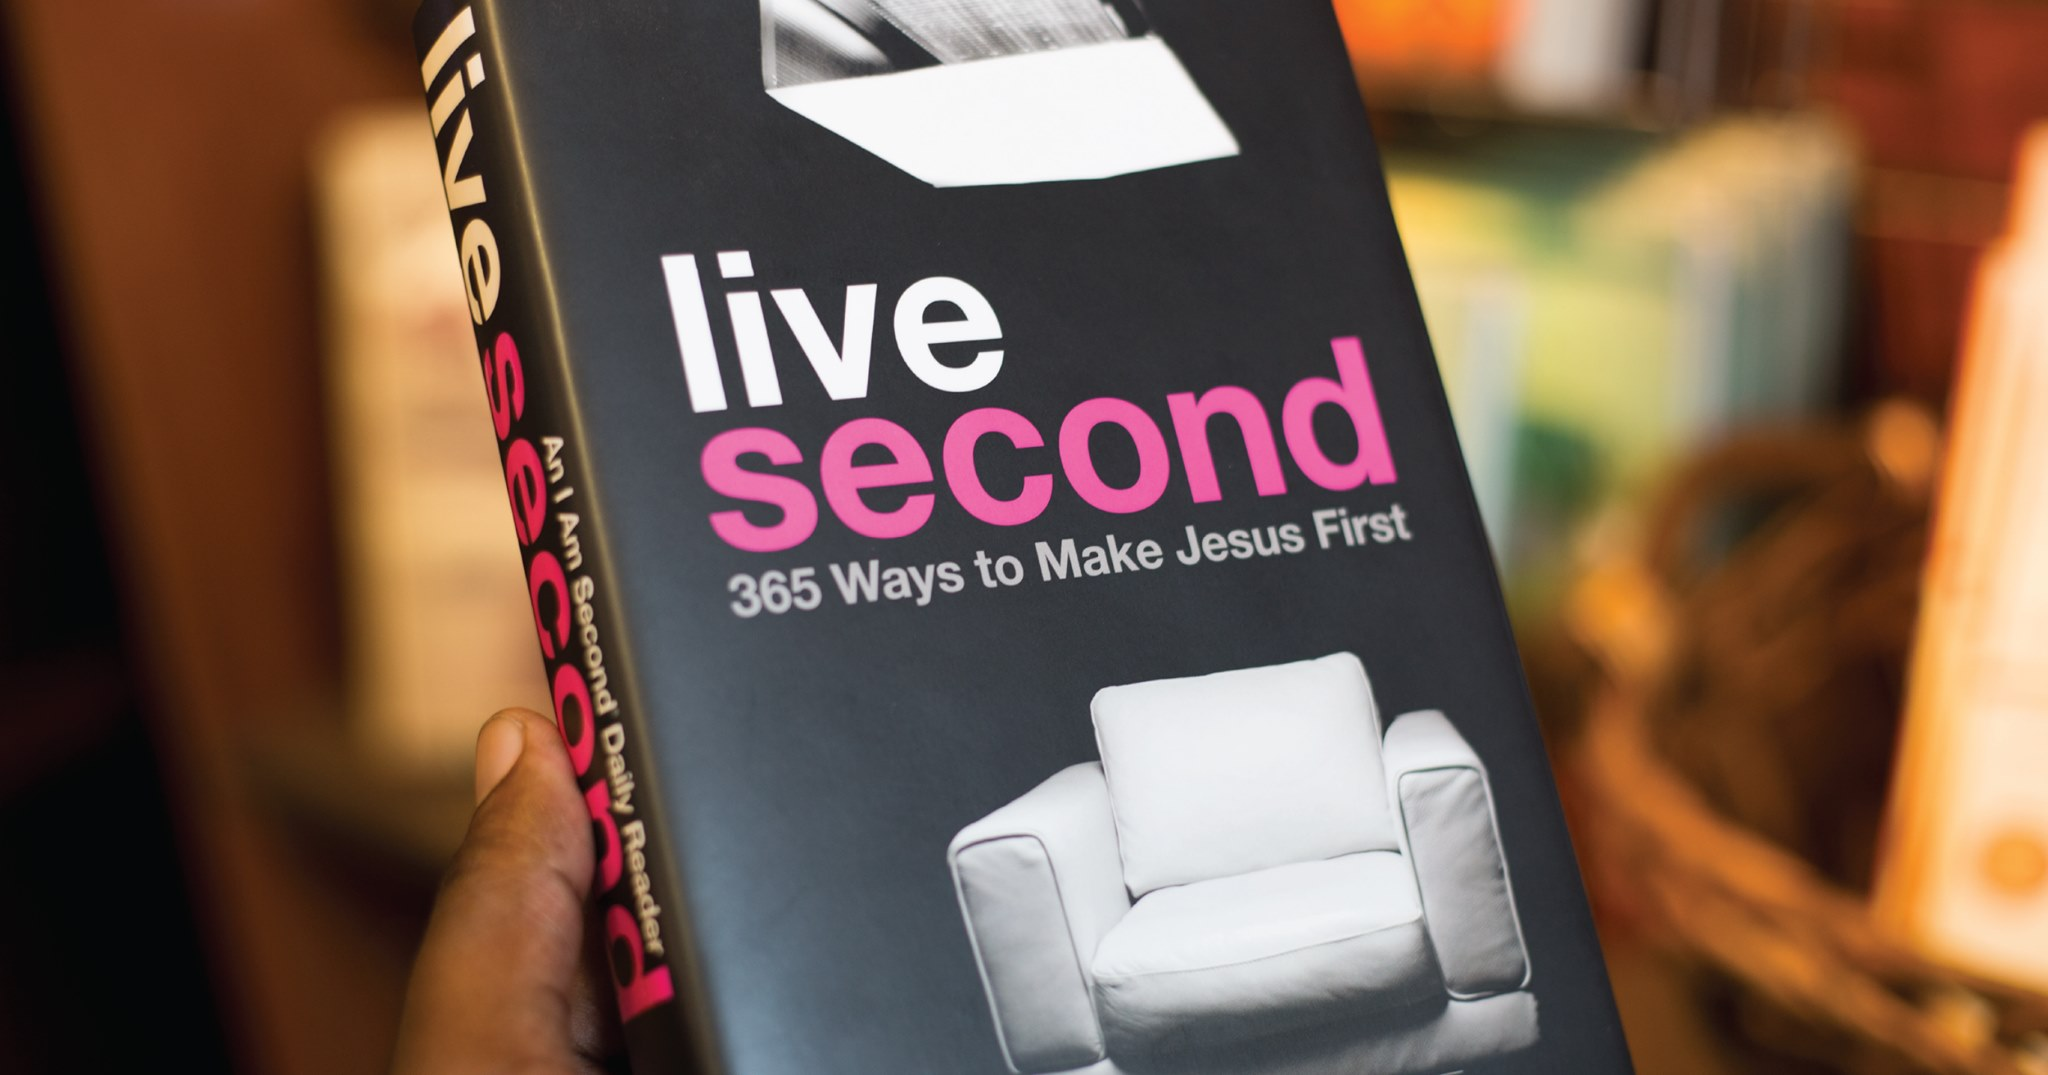 I Am Second unveils new discipleship tool